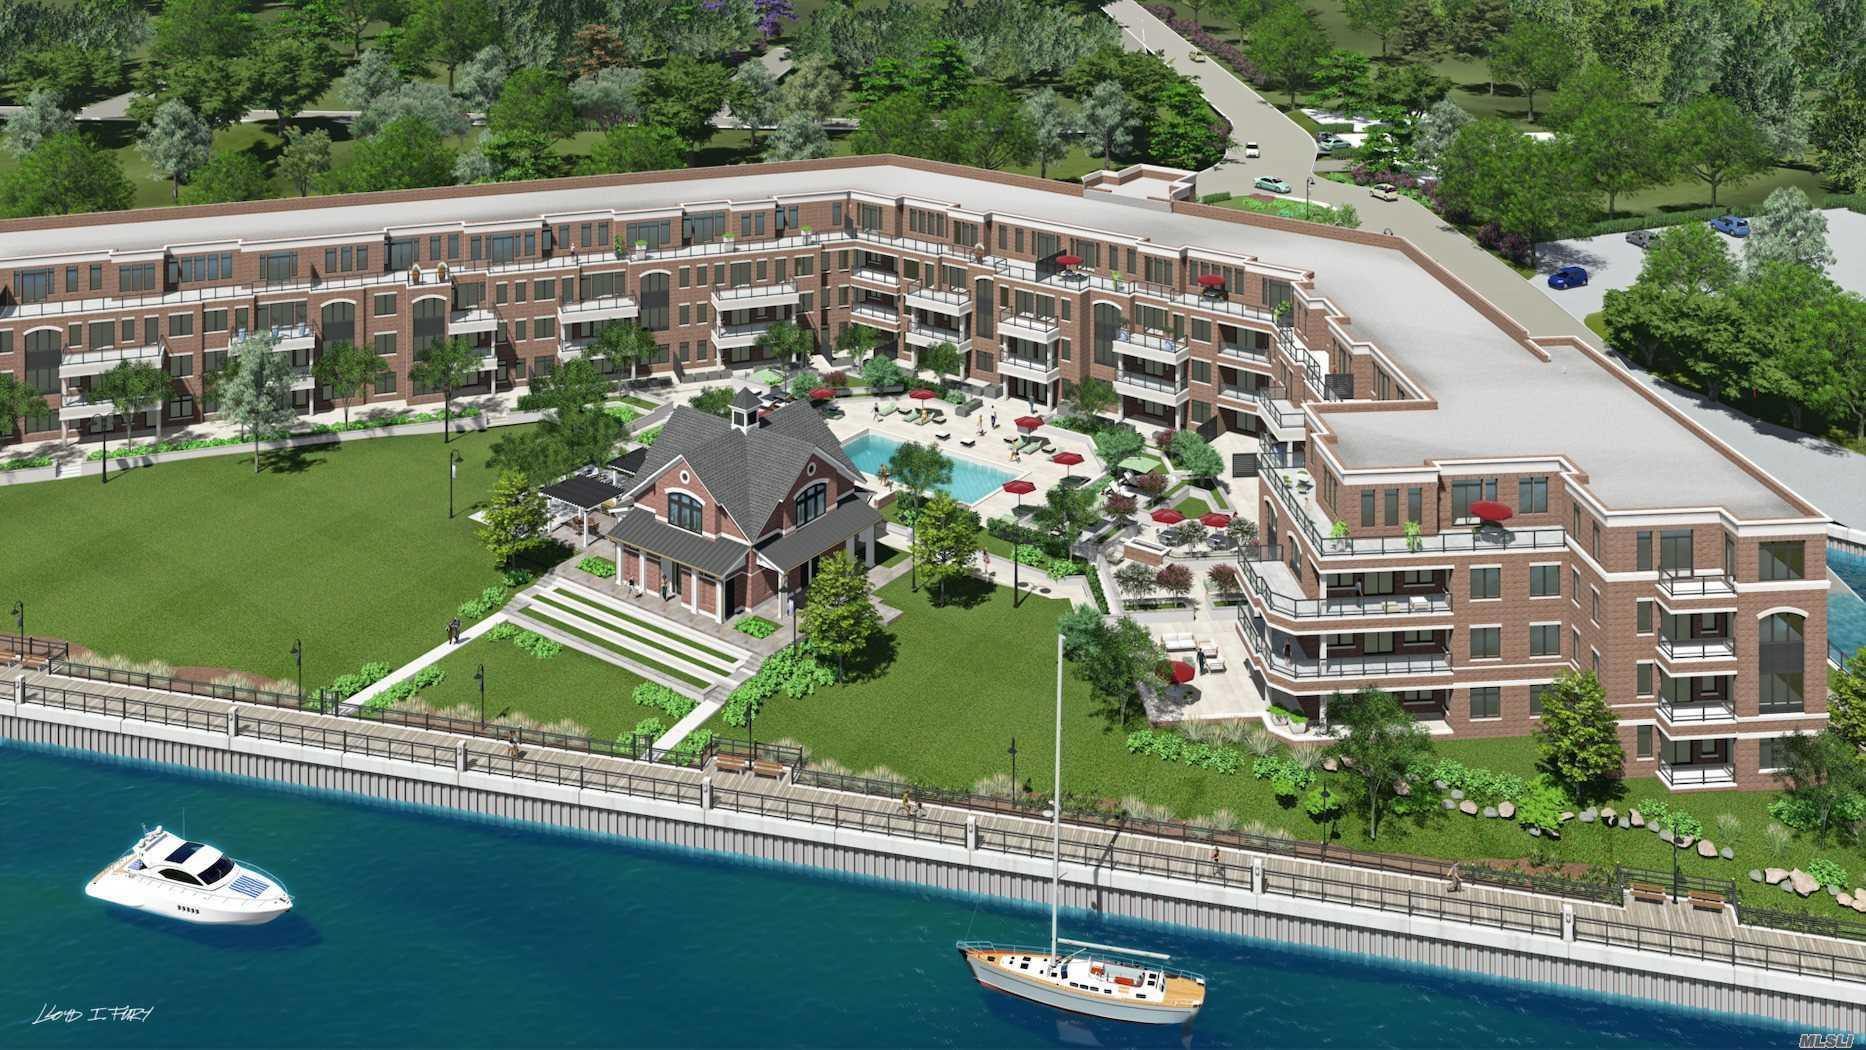 Property for sale at 10 Shore Road # 203, Glenwood Landing NY 11547, Glenwood Landing,  New York 11547